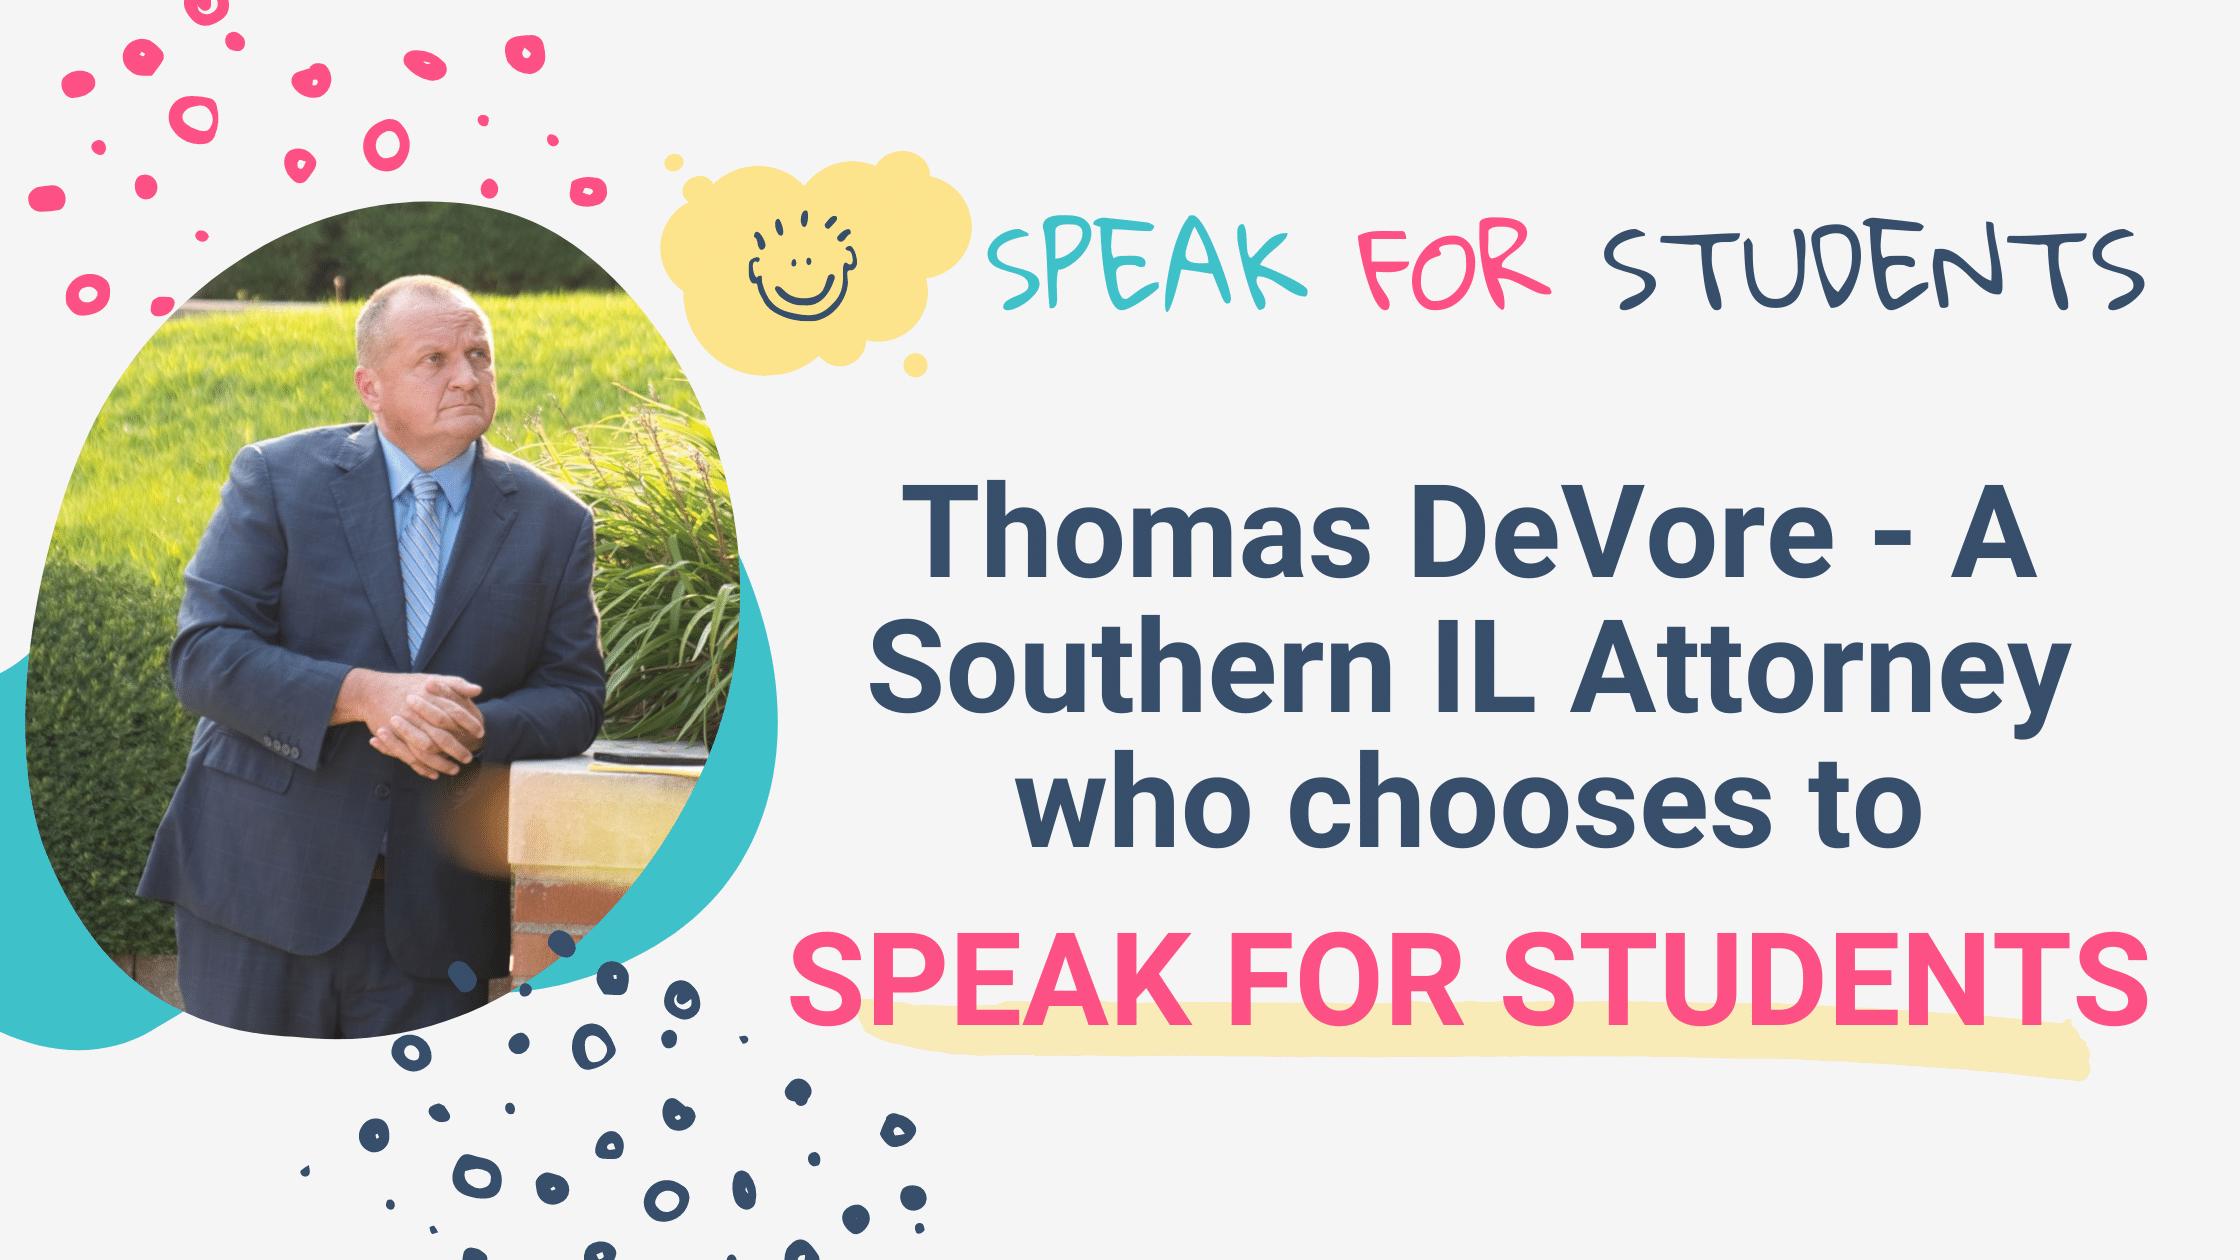 Thomas-DeVore-Speaks-For-Students